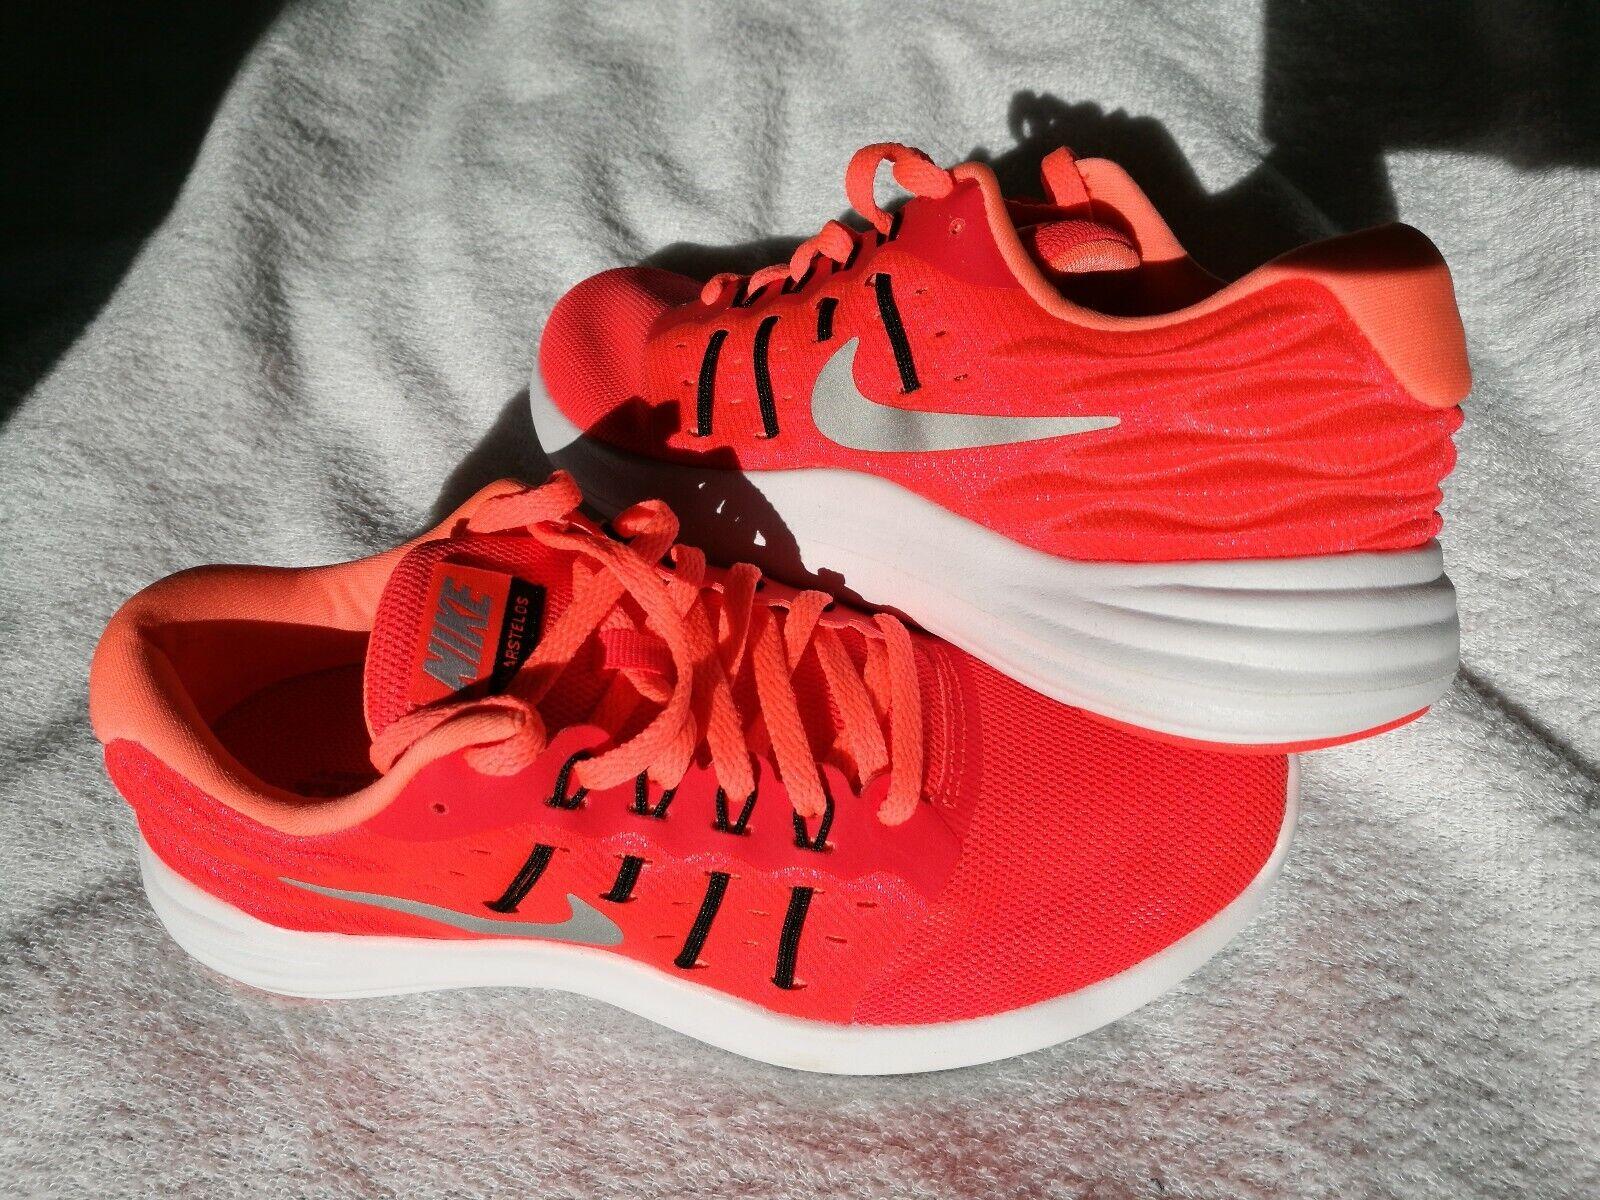 Nike Womens Lunarstelos Trainers UK UK UK Size 4 NEW R.R.P 54736b